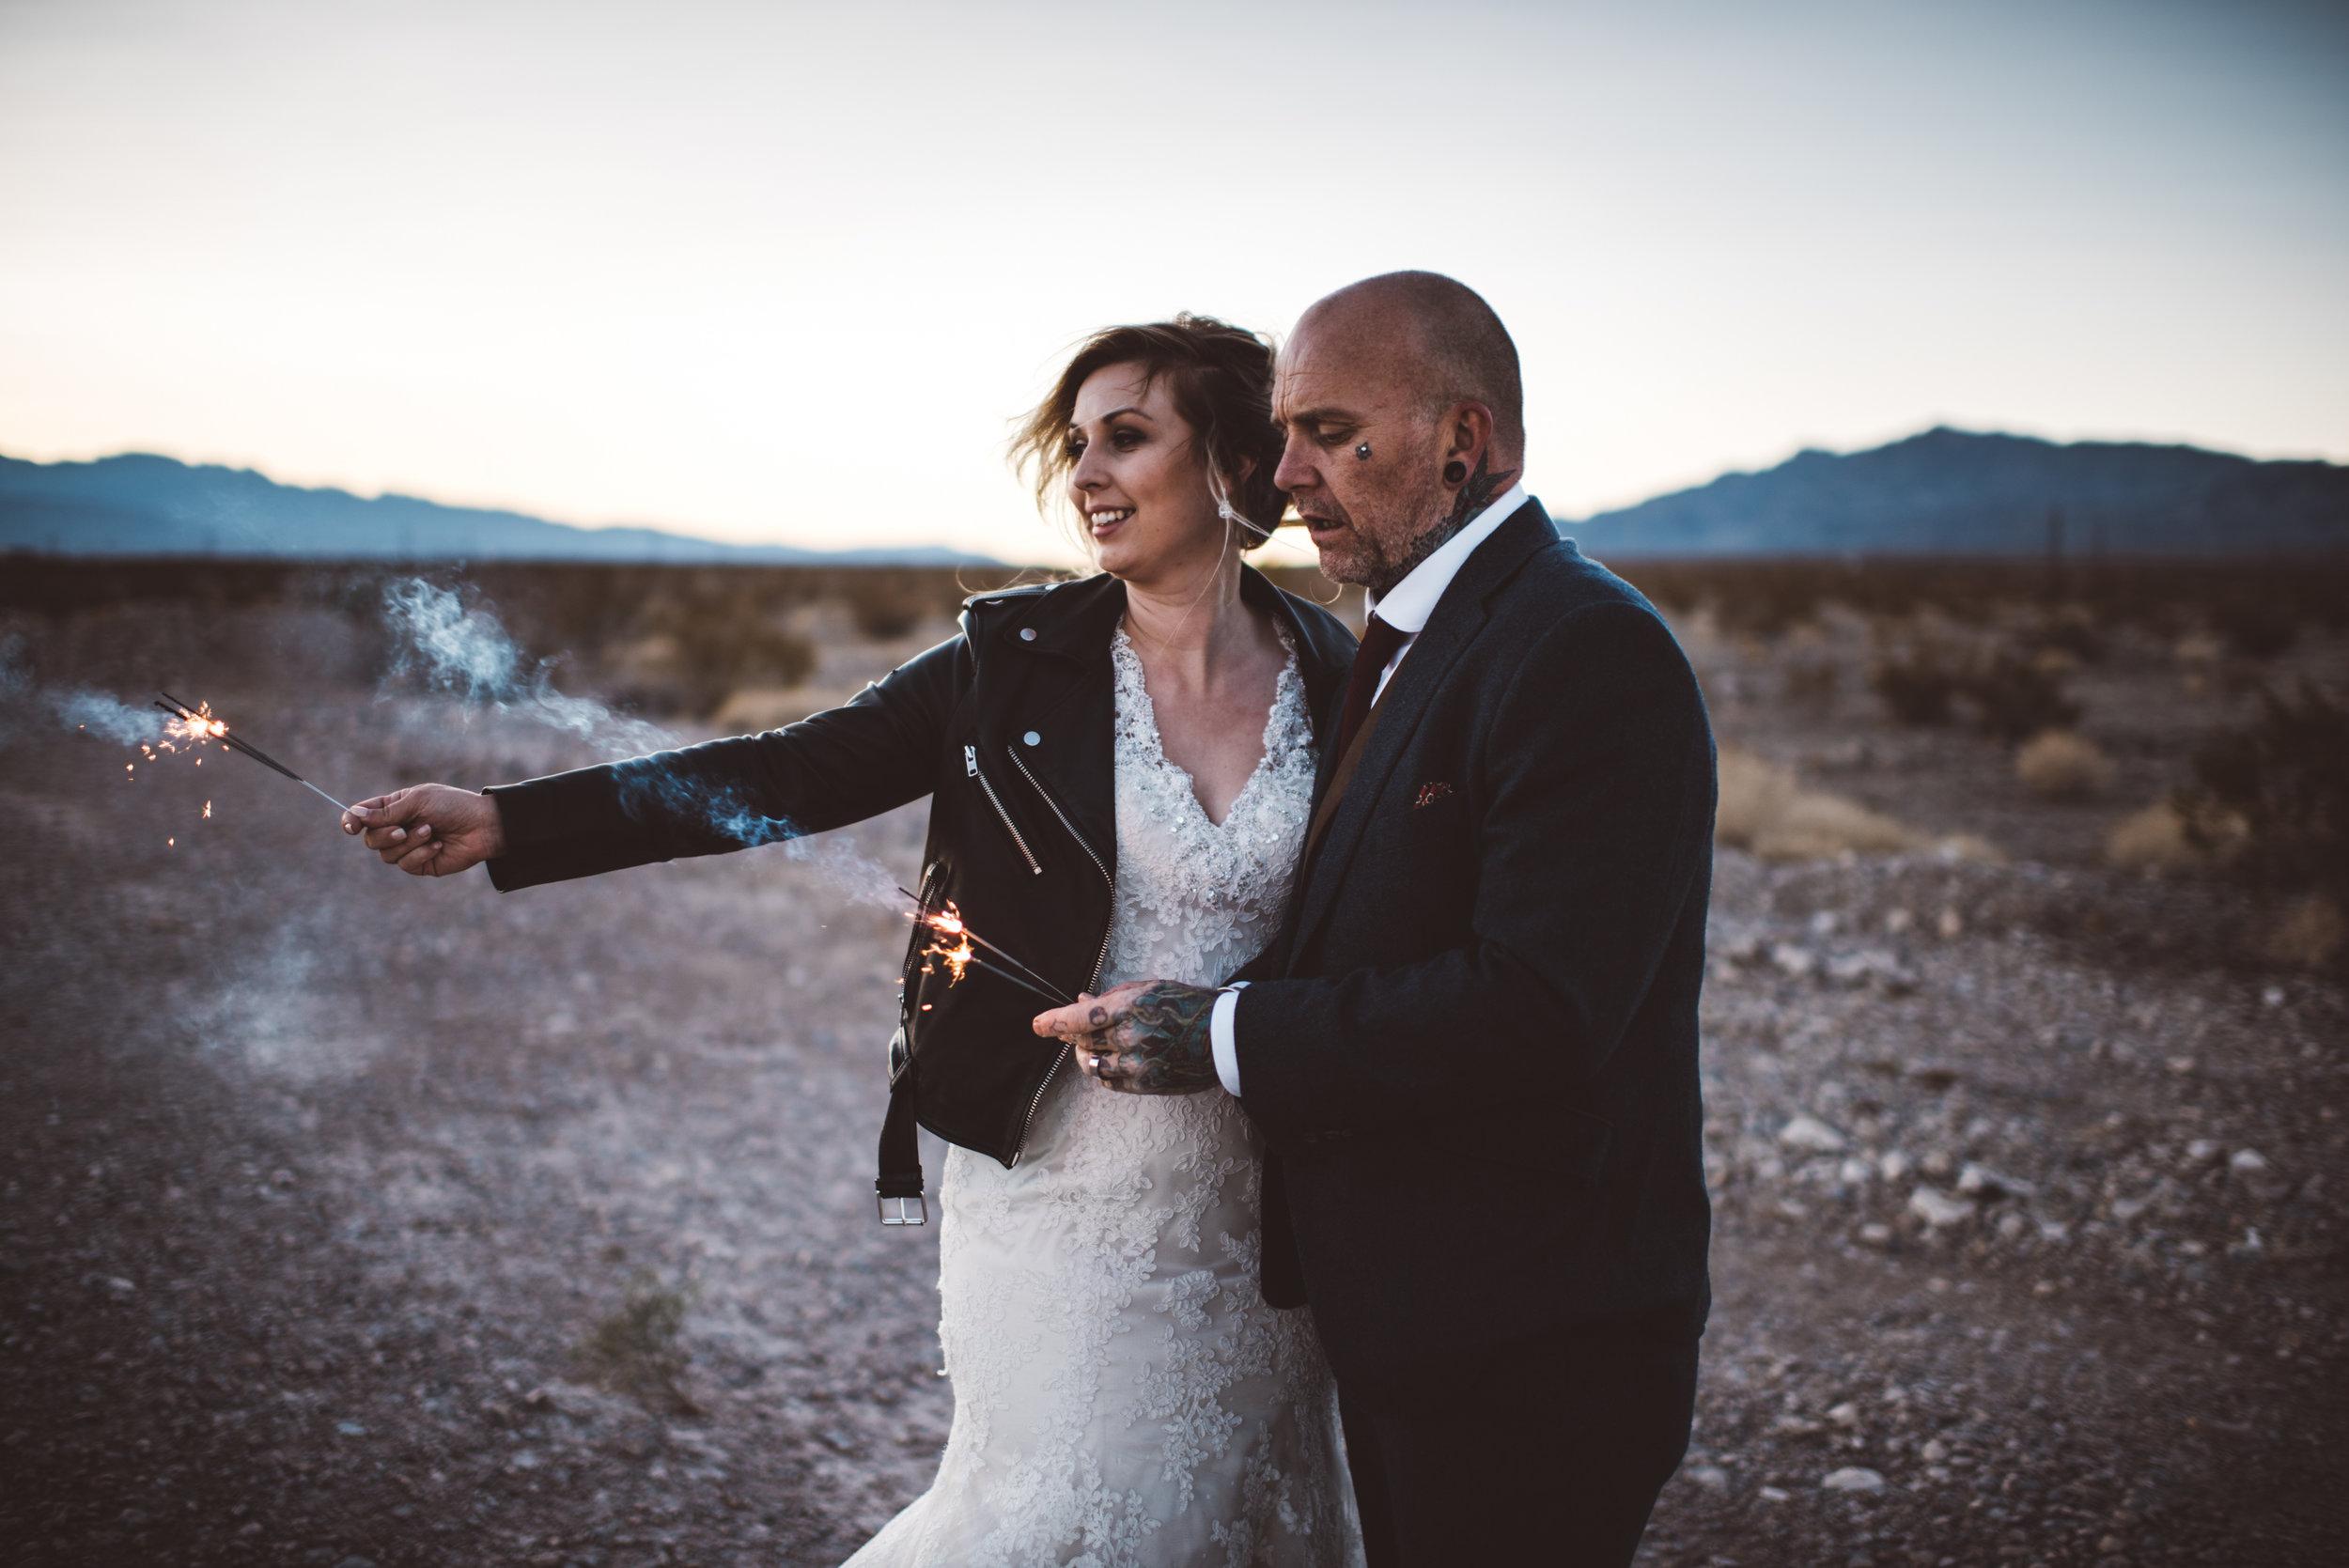 Las Vegas Elopement Photographer Ashley Marie Myers Rock'n Roll Bride-234.jpg